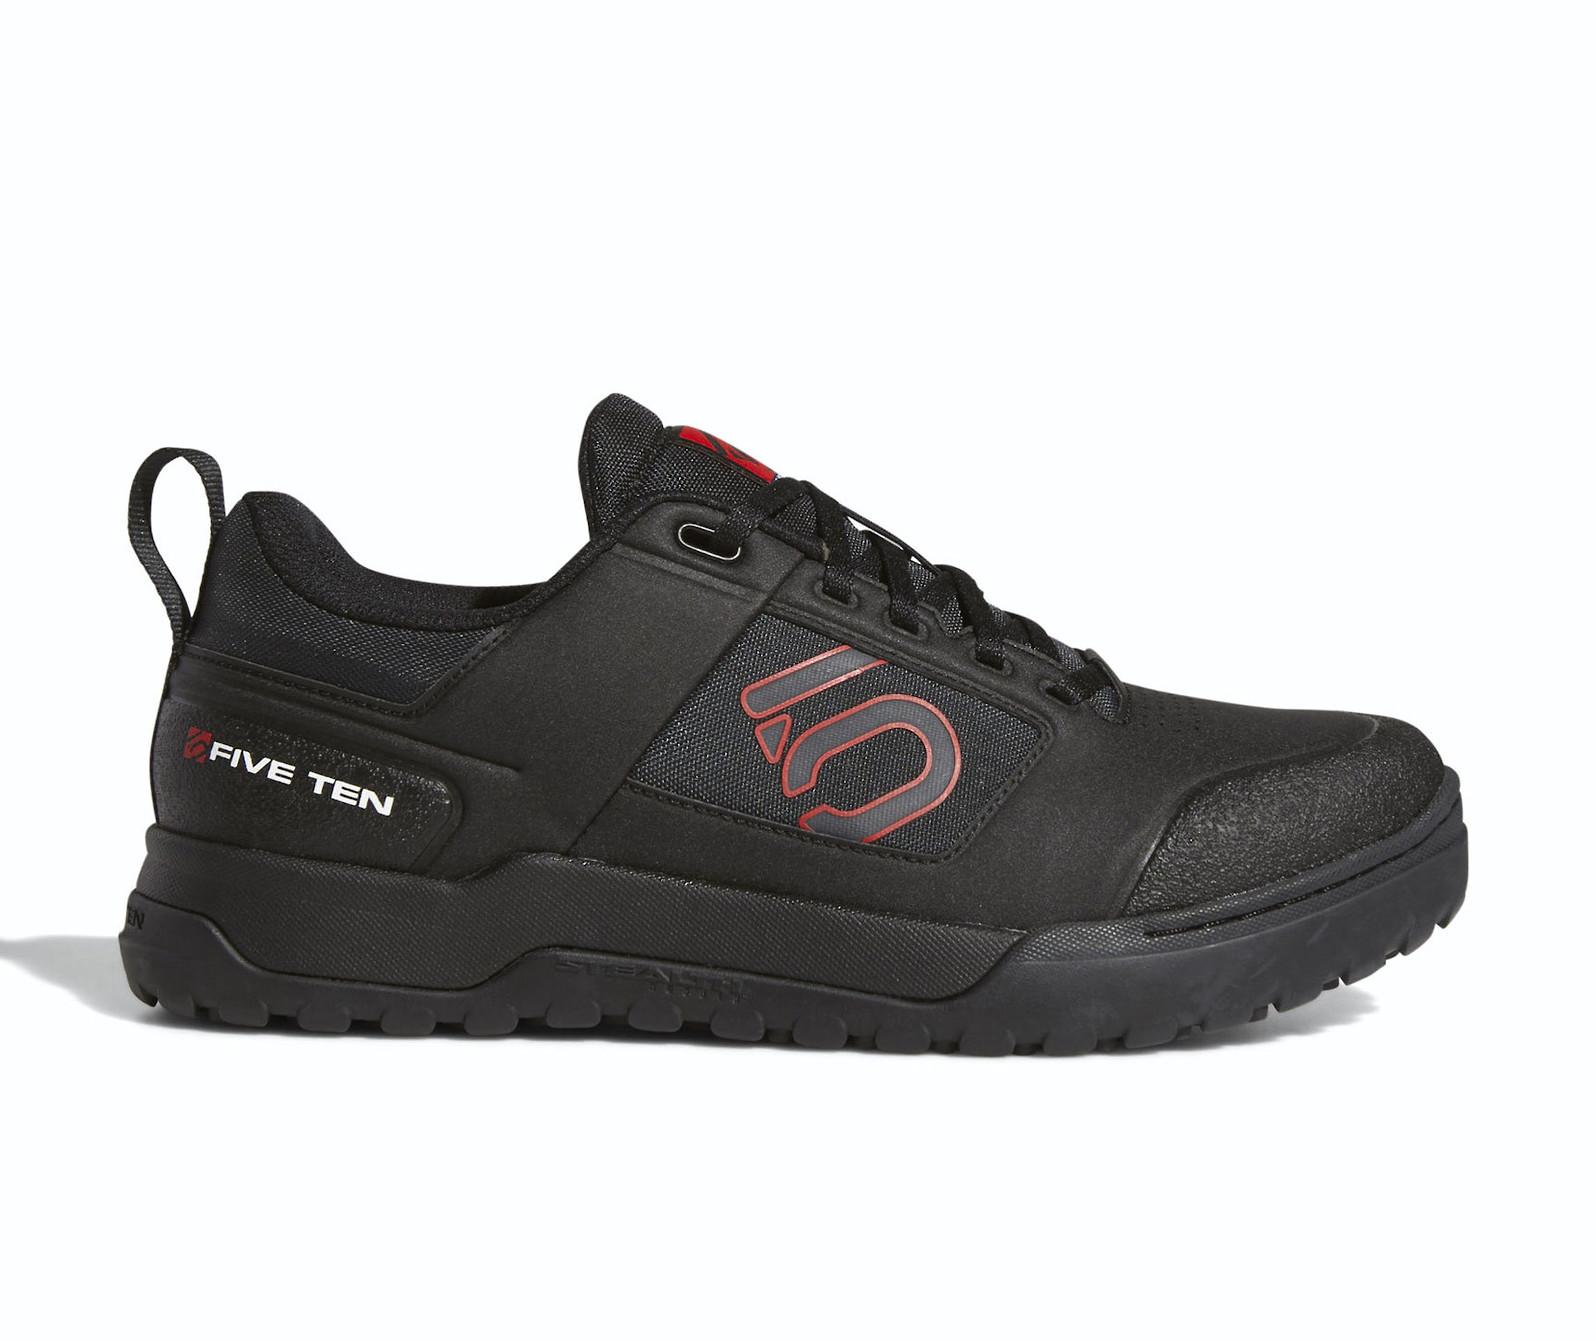 Five Ten Impact Pro Flat Pedal Shoe (Black/Carbon/Red)